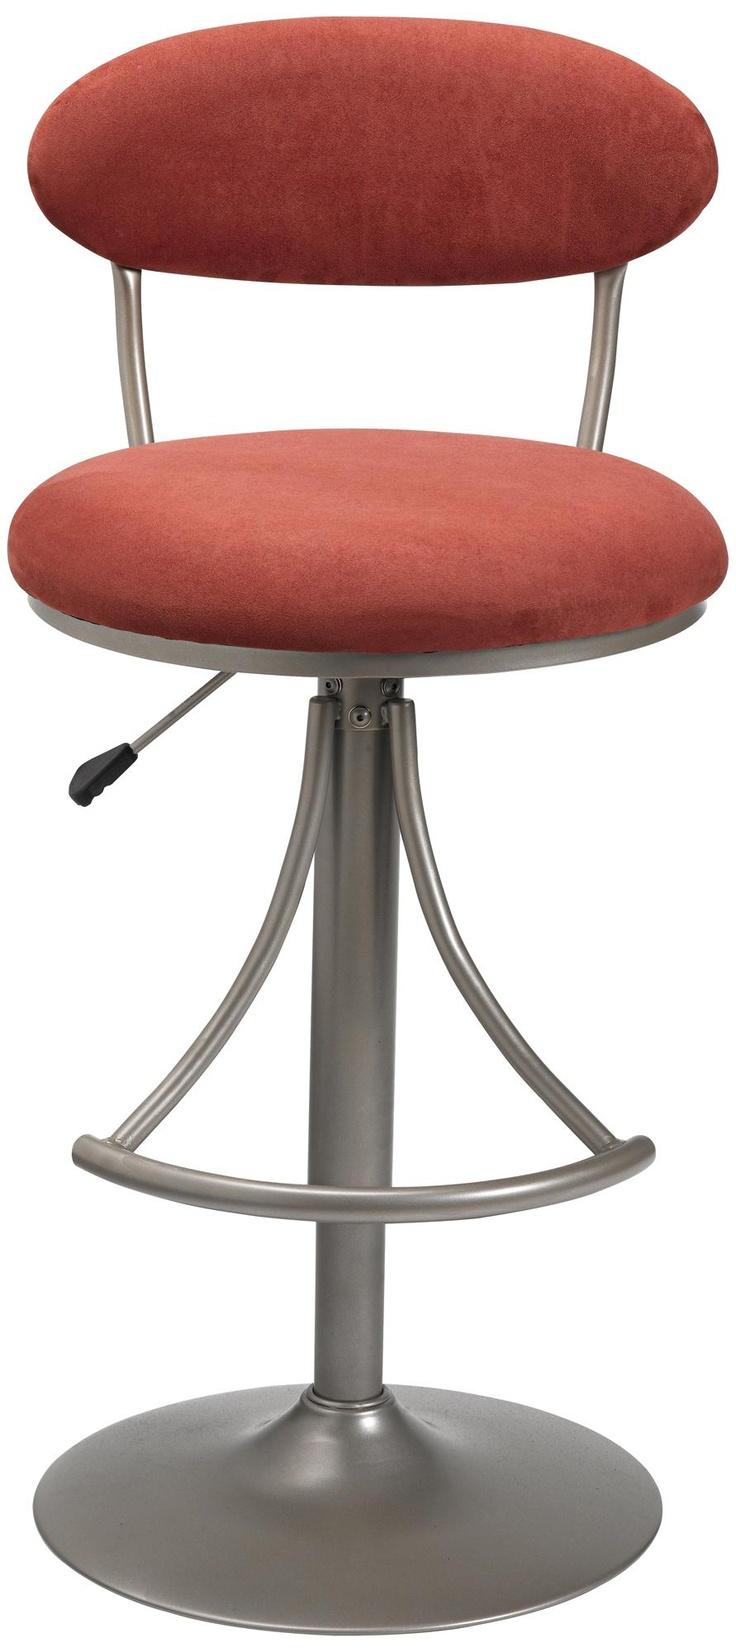 Hillsdale Venus Flame Contemporary Adjustable Bar Stool   Style # K8990